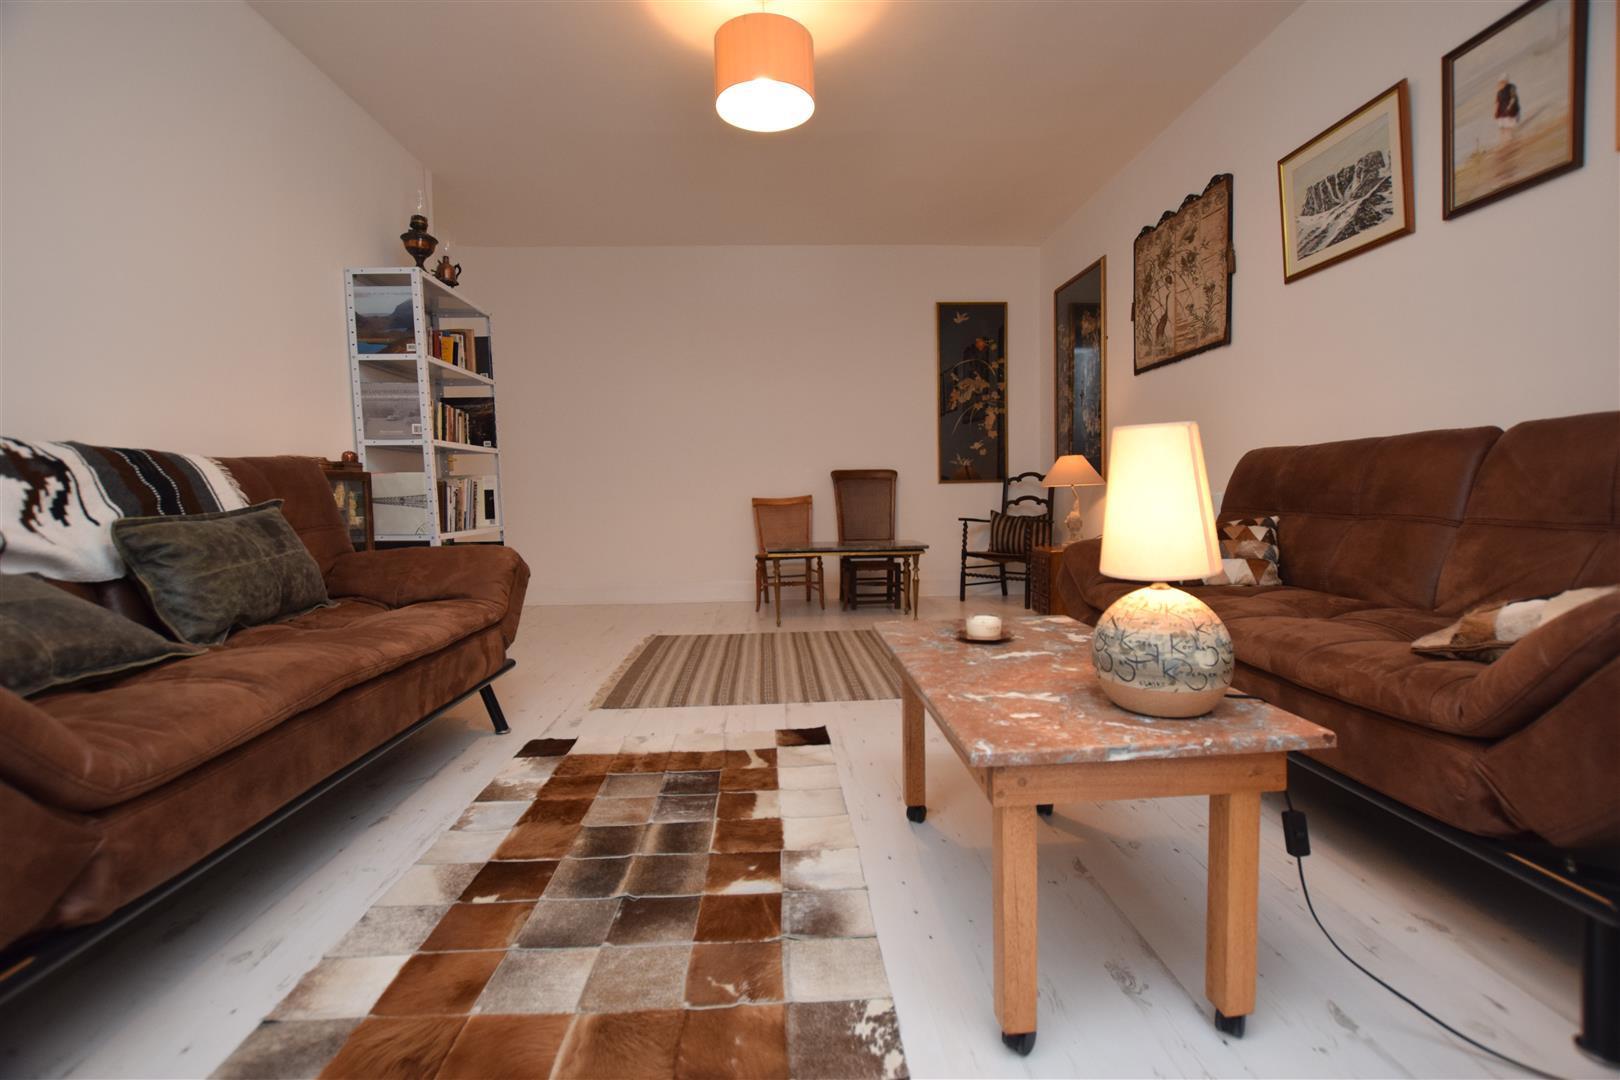 Flat 3, 10, Murthly Terrace, Birnam, Dunkeld, Perthshire, PH8 0BG, UK